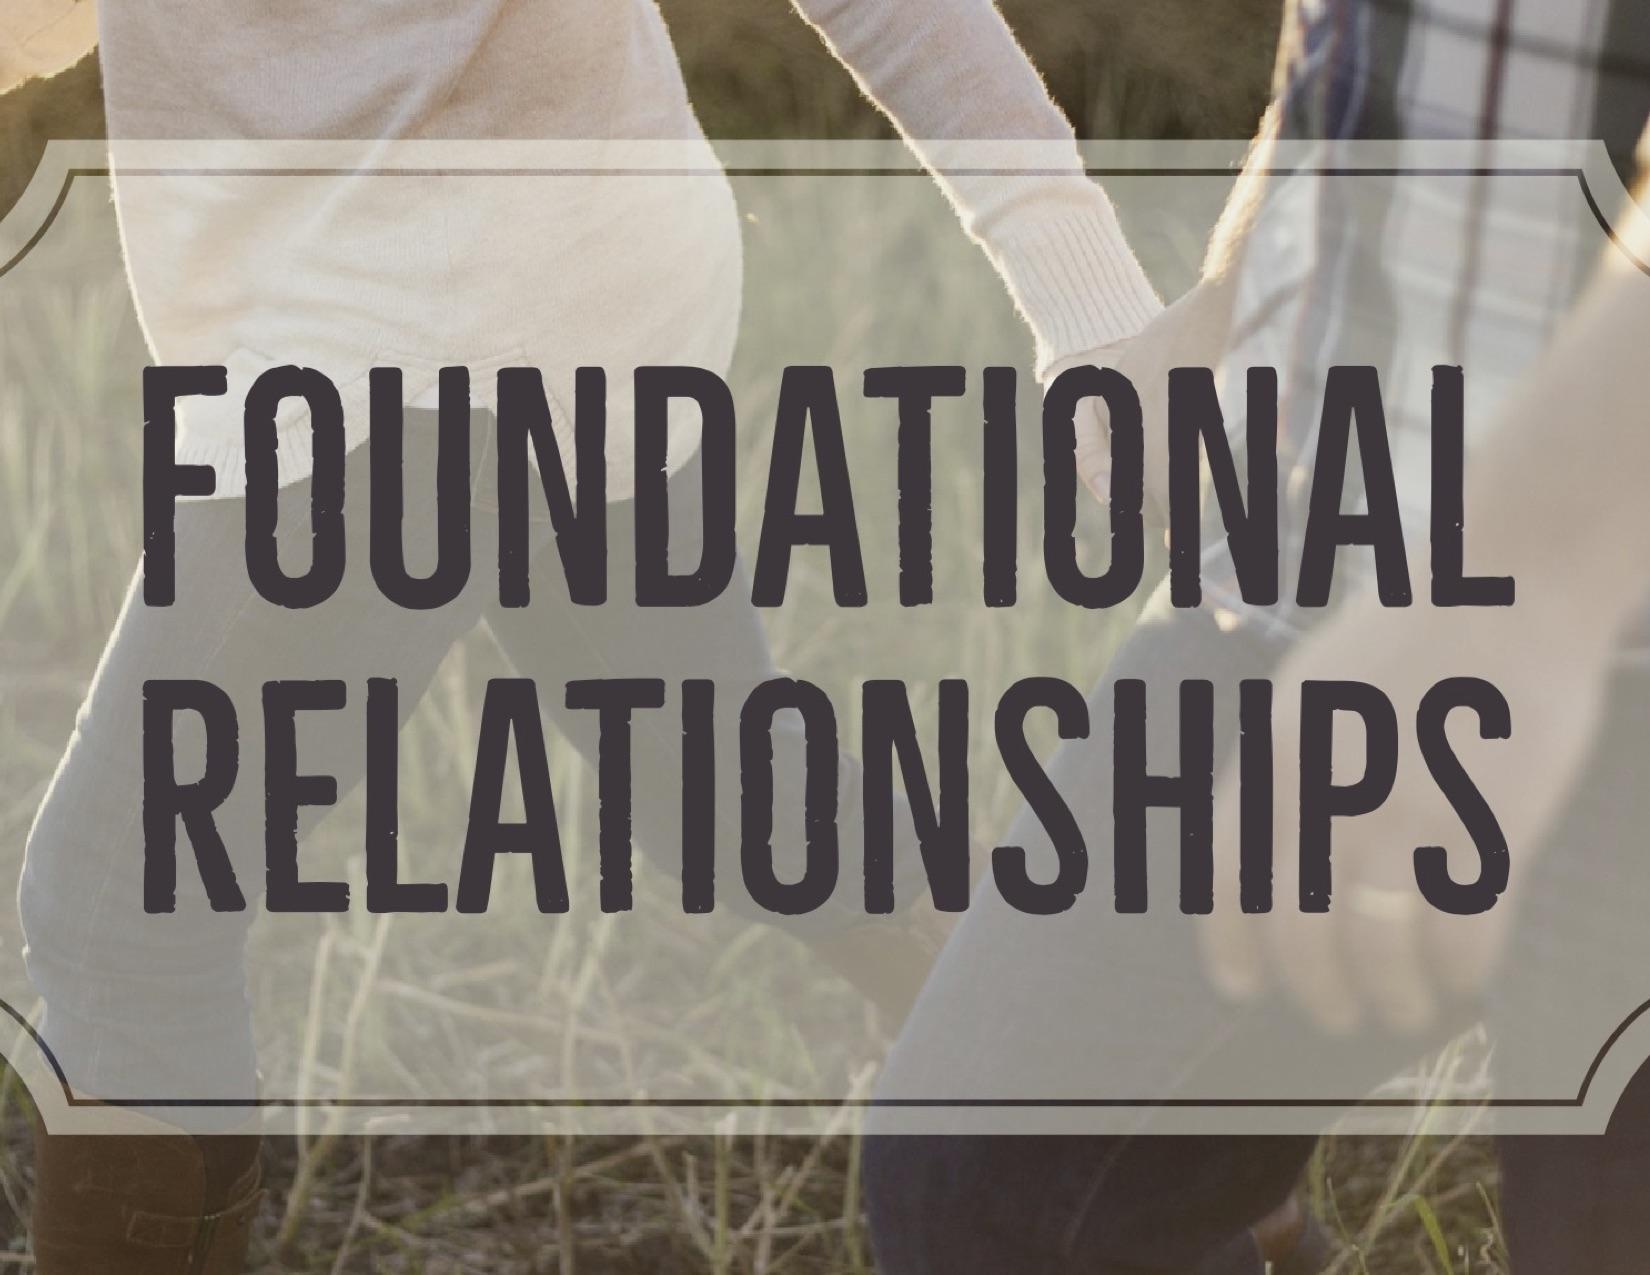 Foundational Relationships copy.jpgarriage